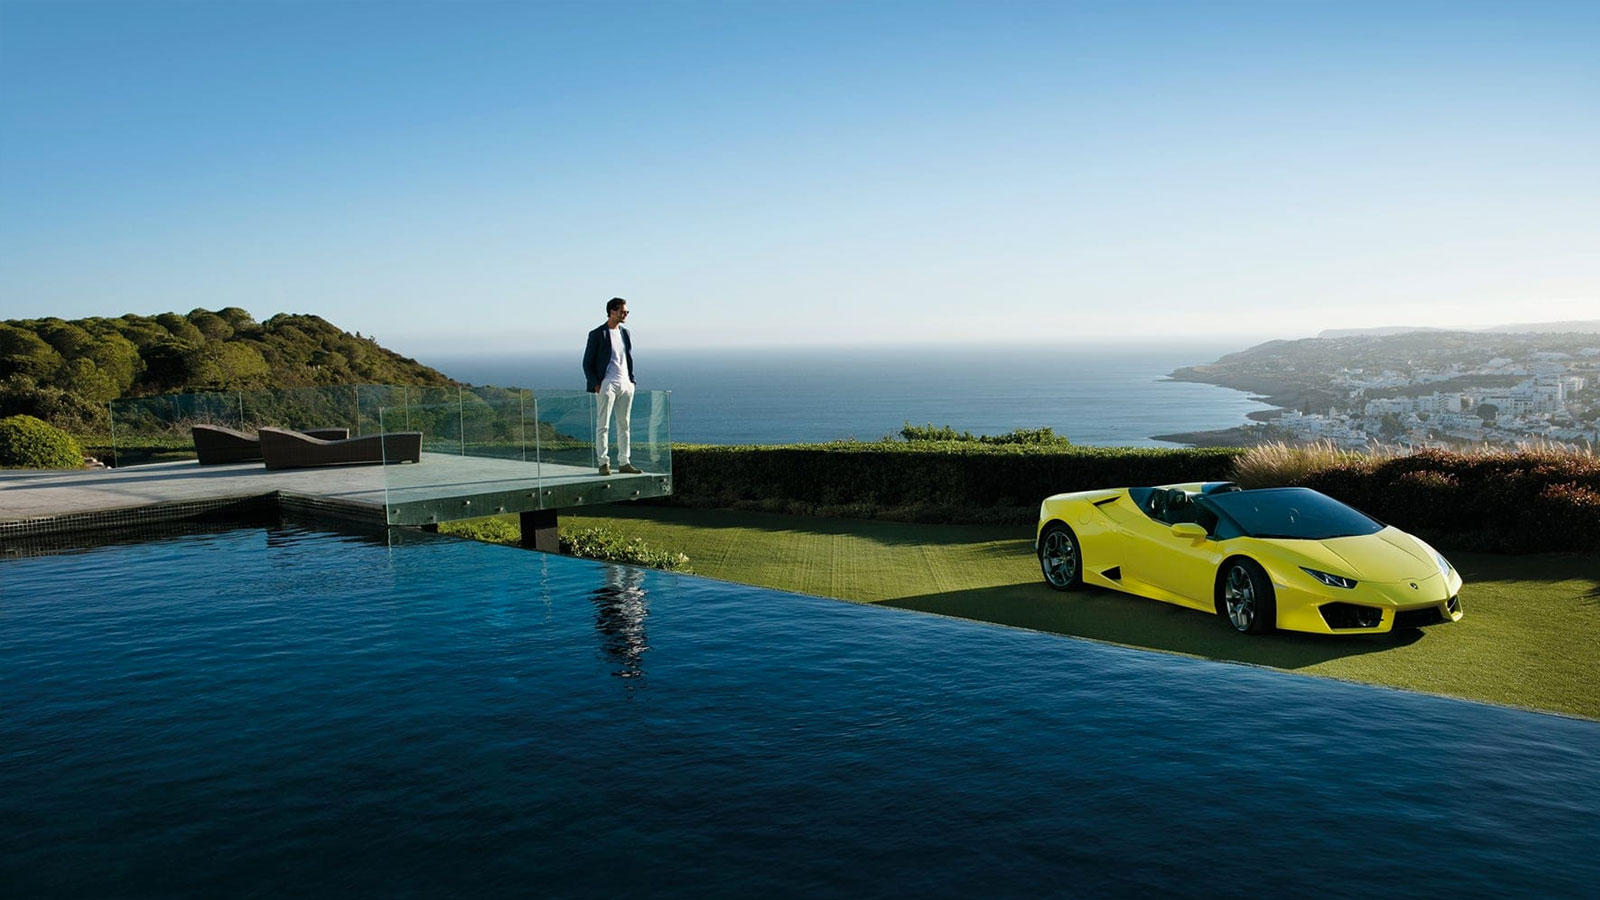 Lamborghini Huracan RWD Spyder - Breathtaking Technology image 3